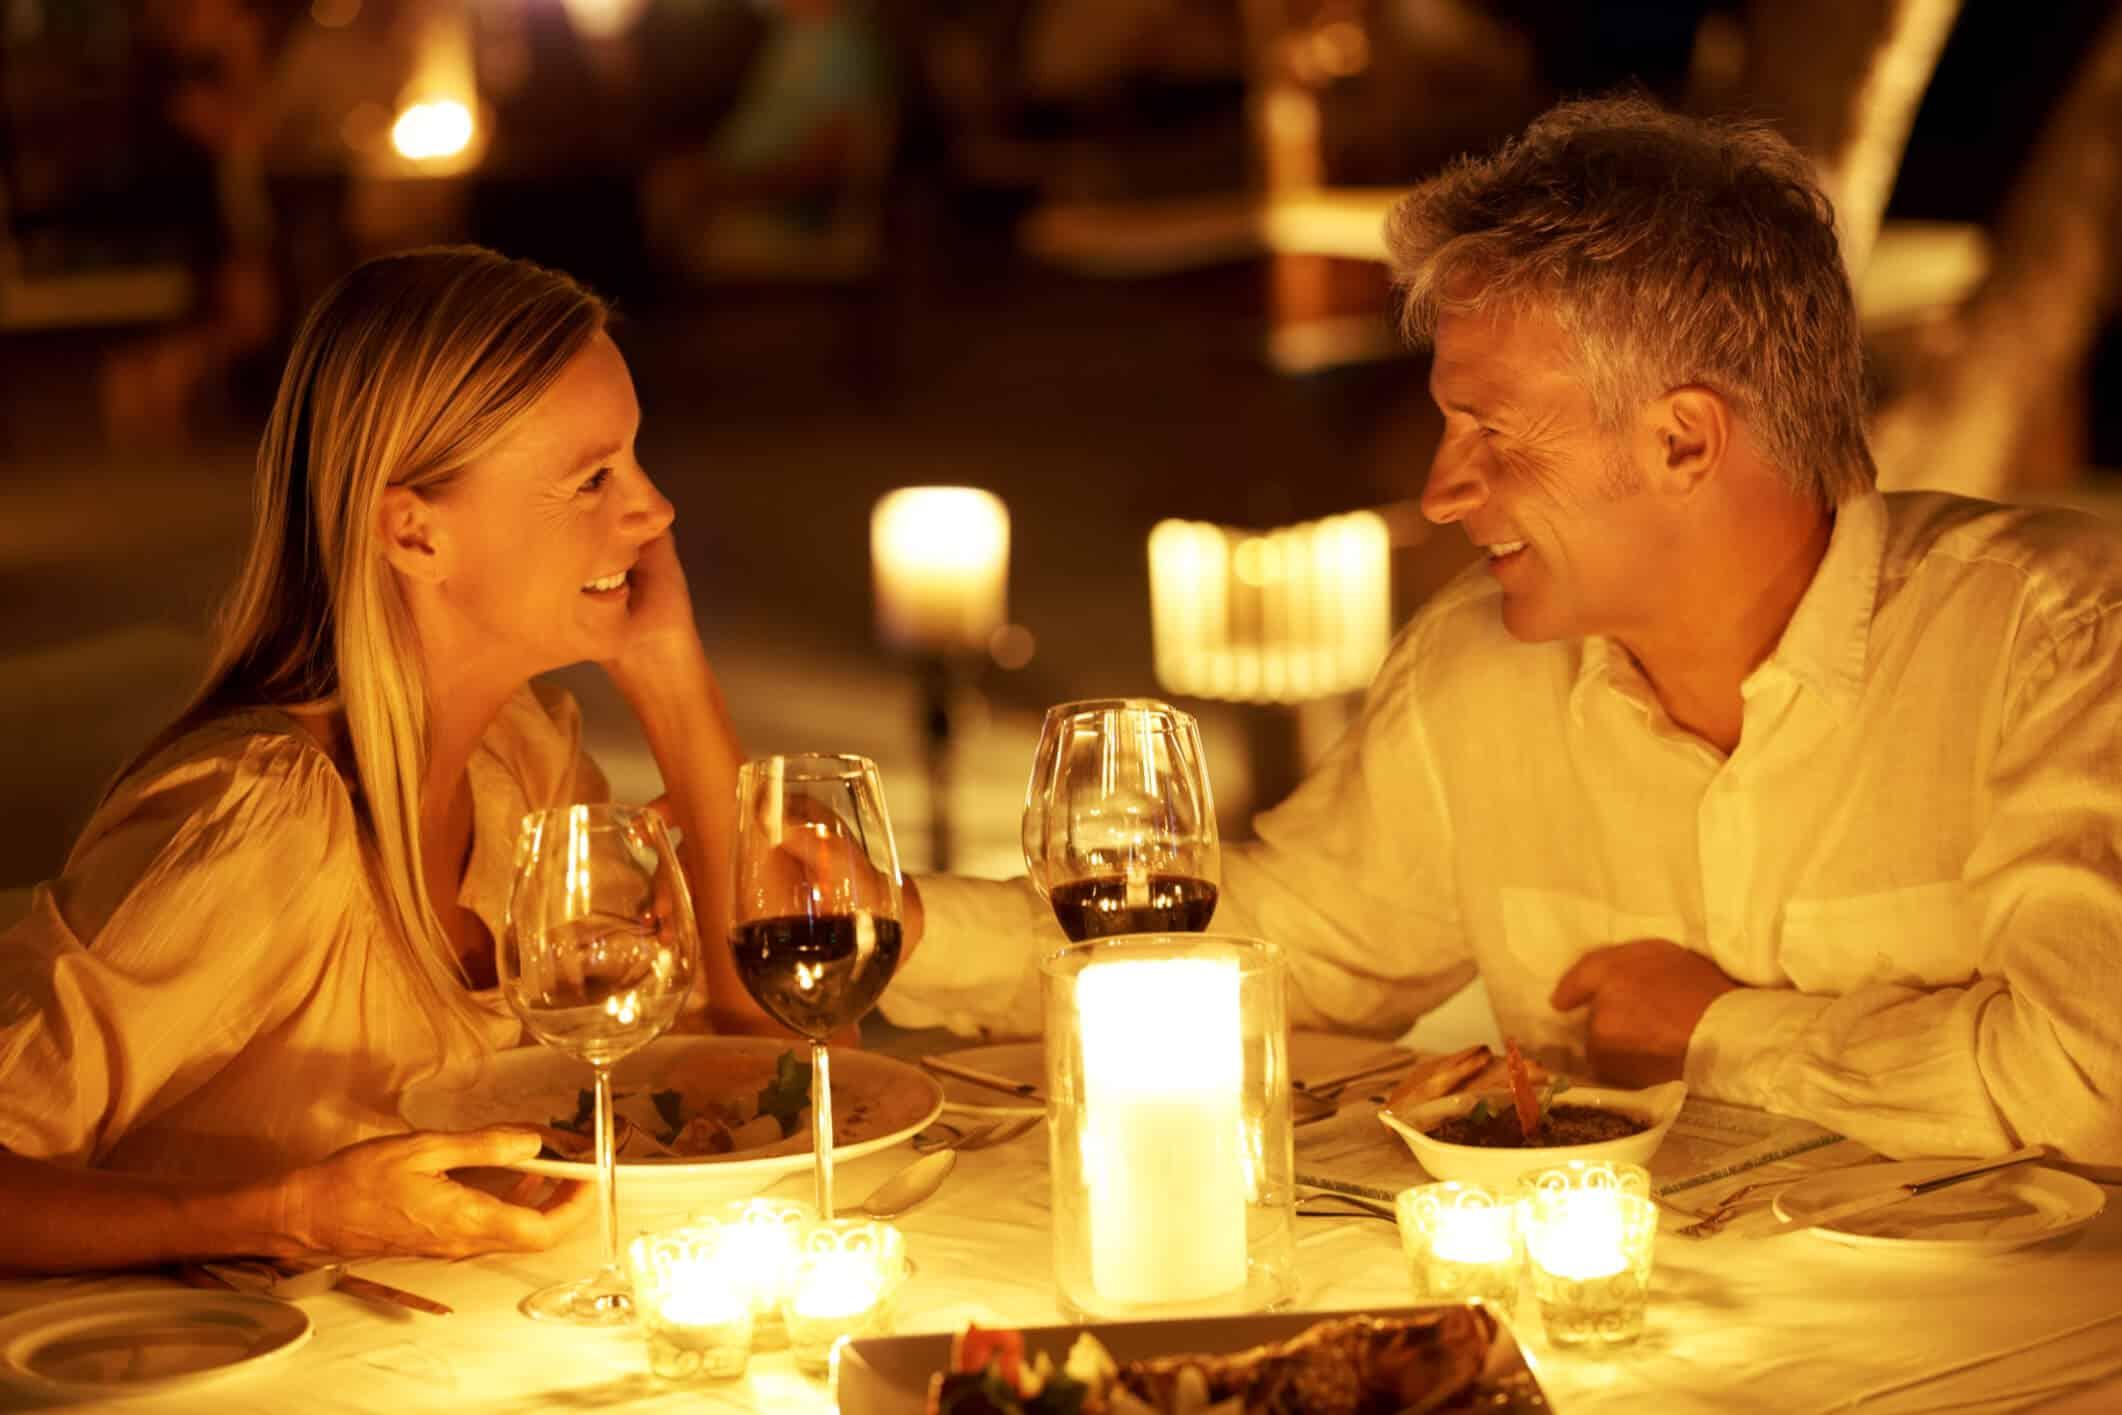 Romance in a restaurant